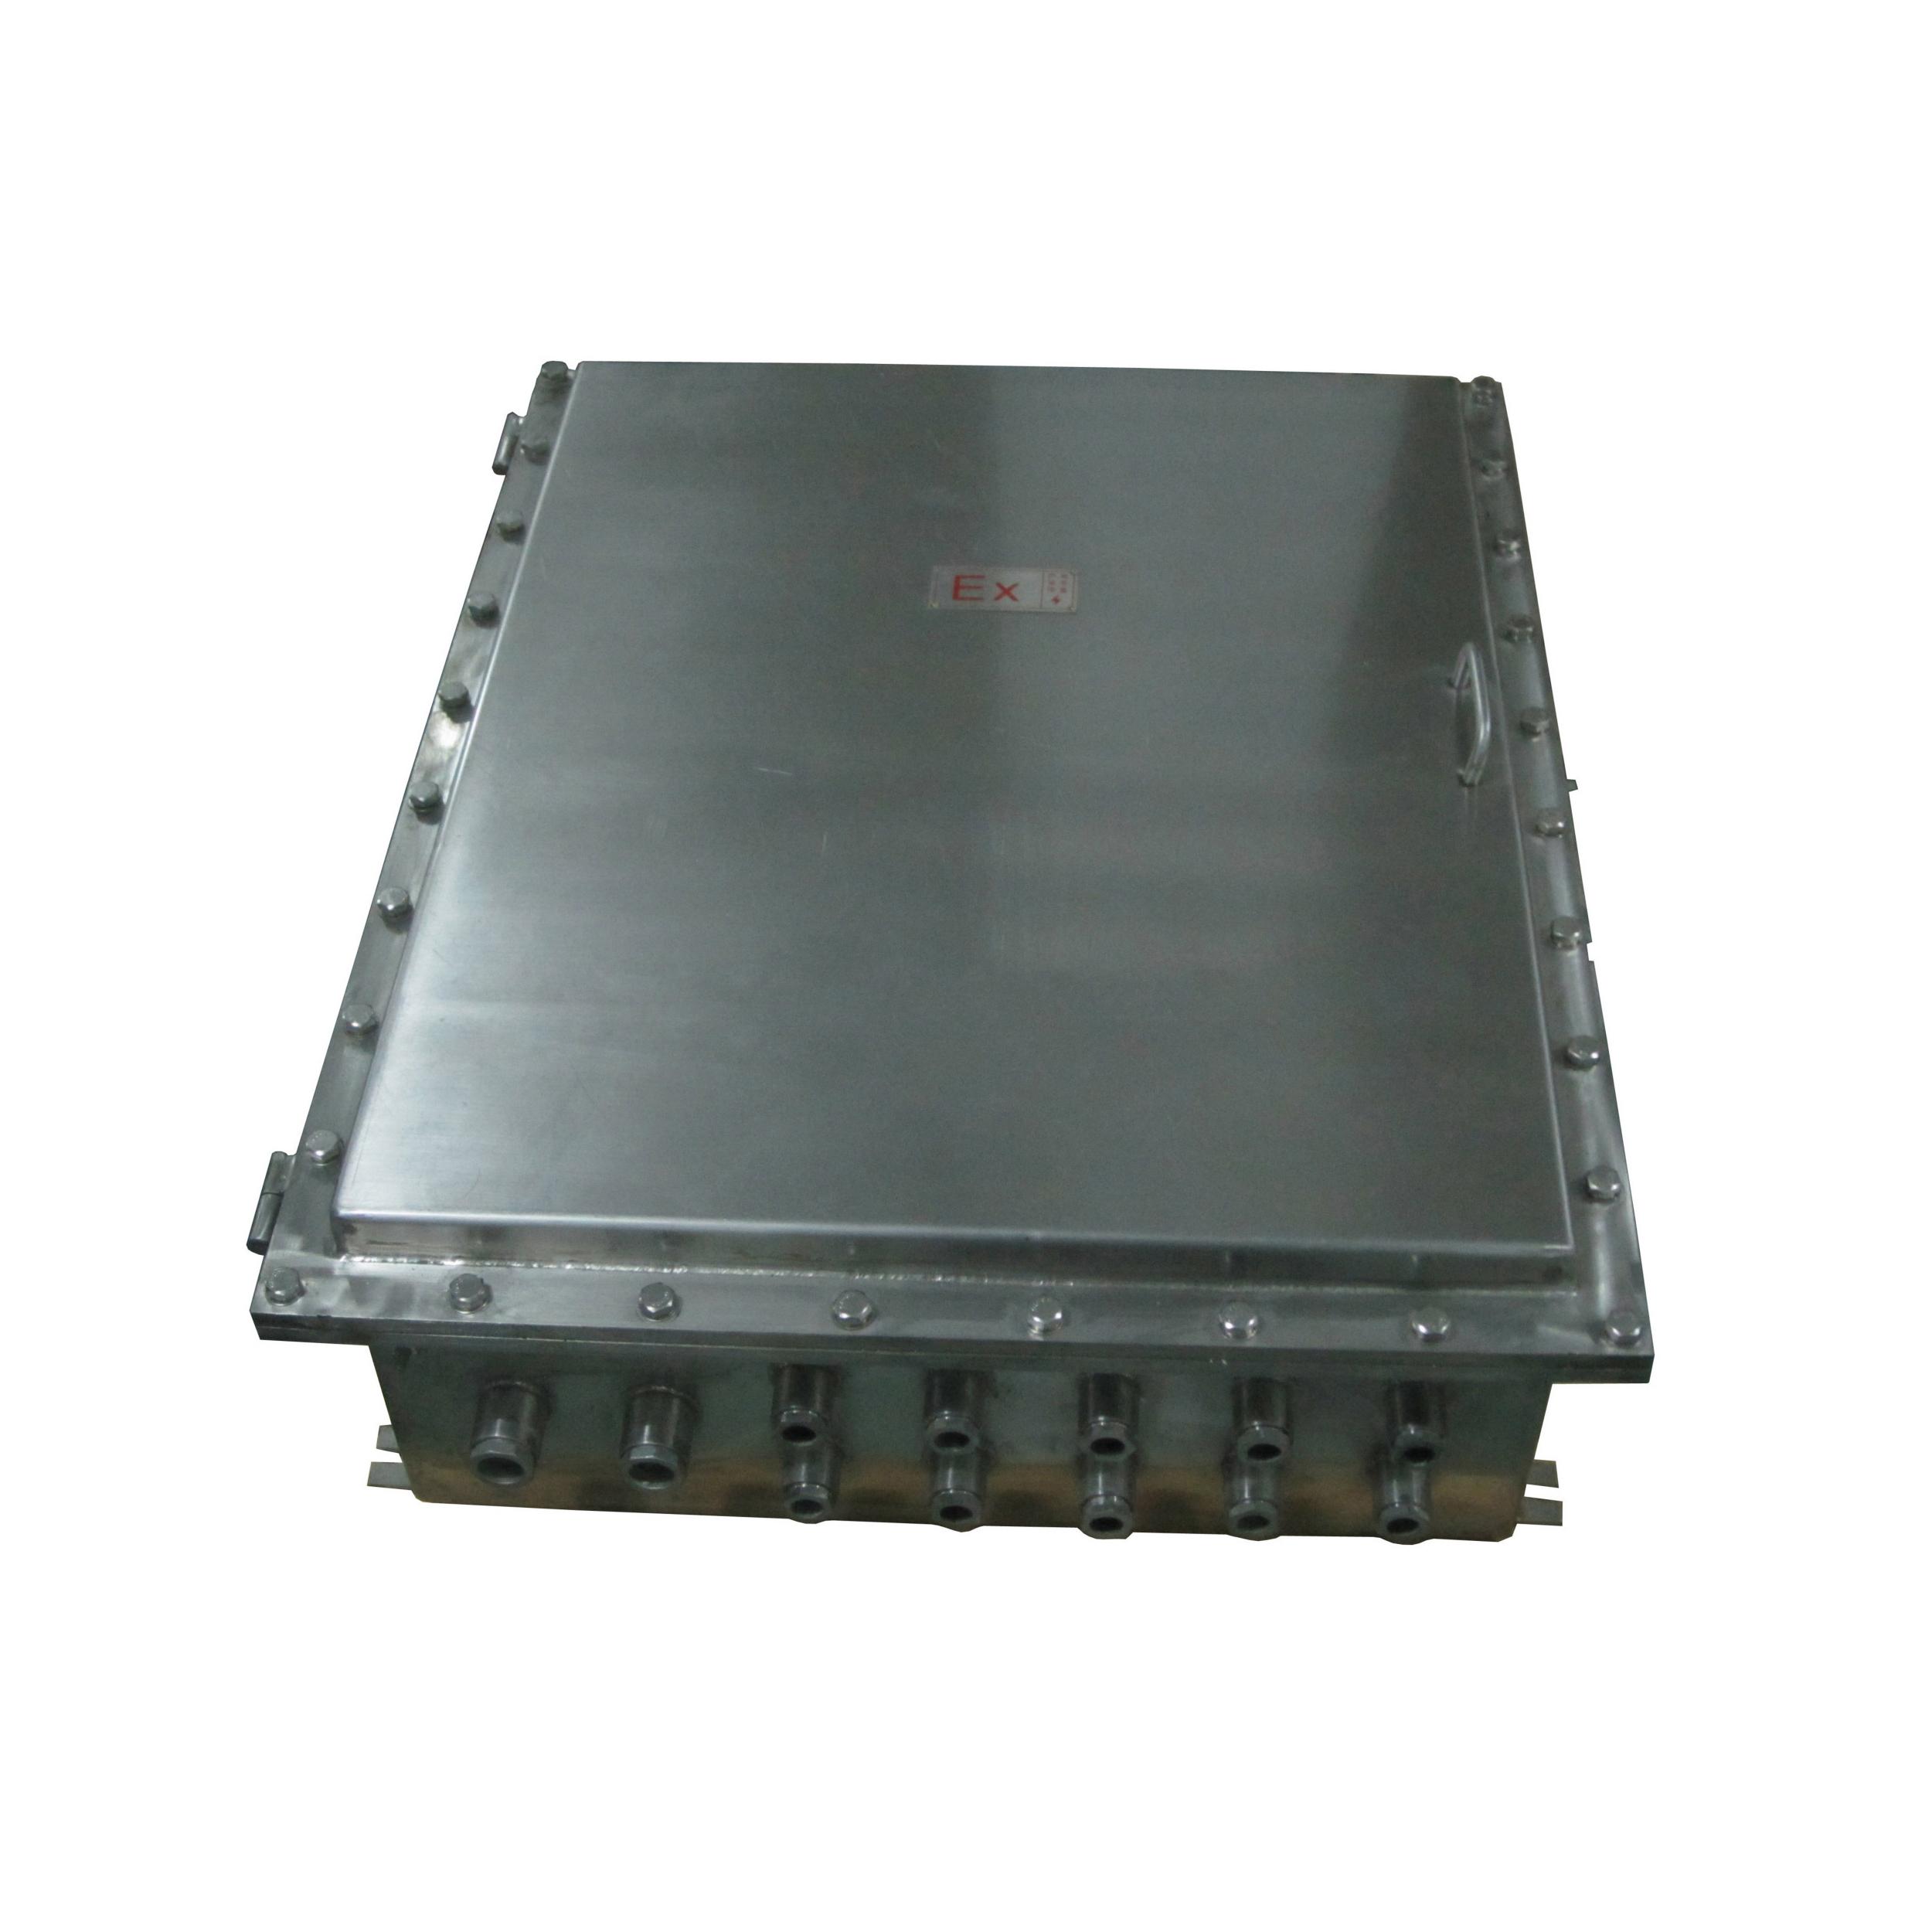 bxmd不锈钢防爆配电箱,bxmd不锈钢防爆配电箱价格,bxmd不锈钢防爆配电箱厂家